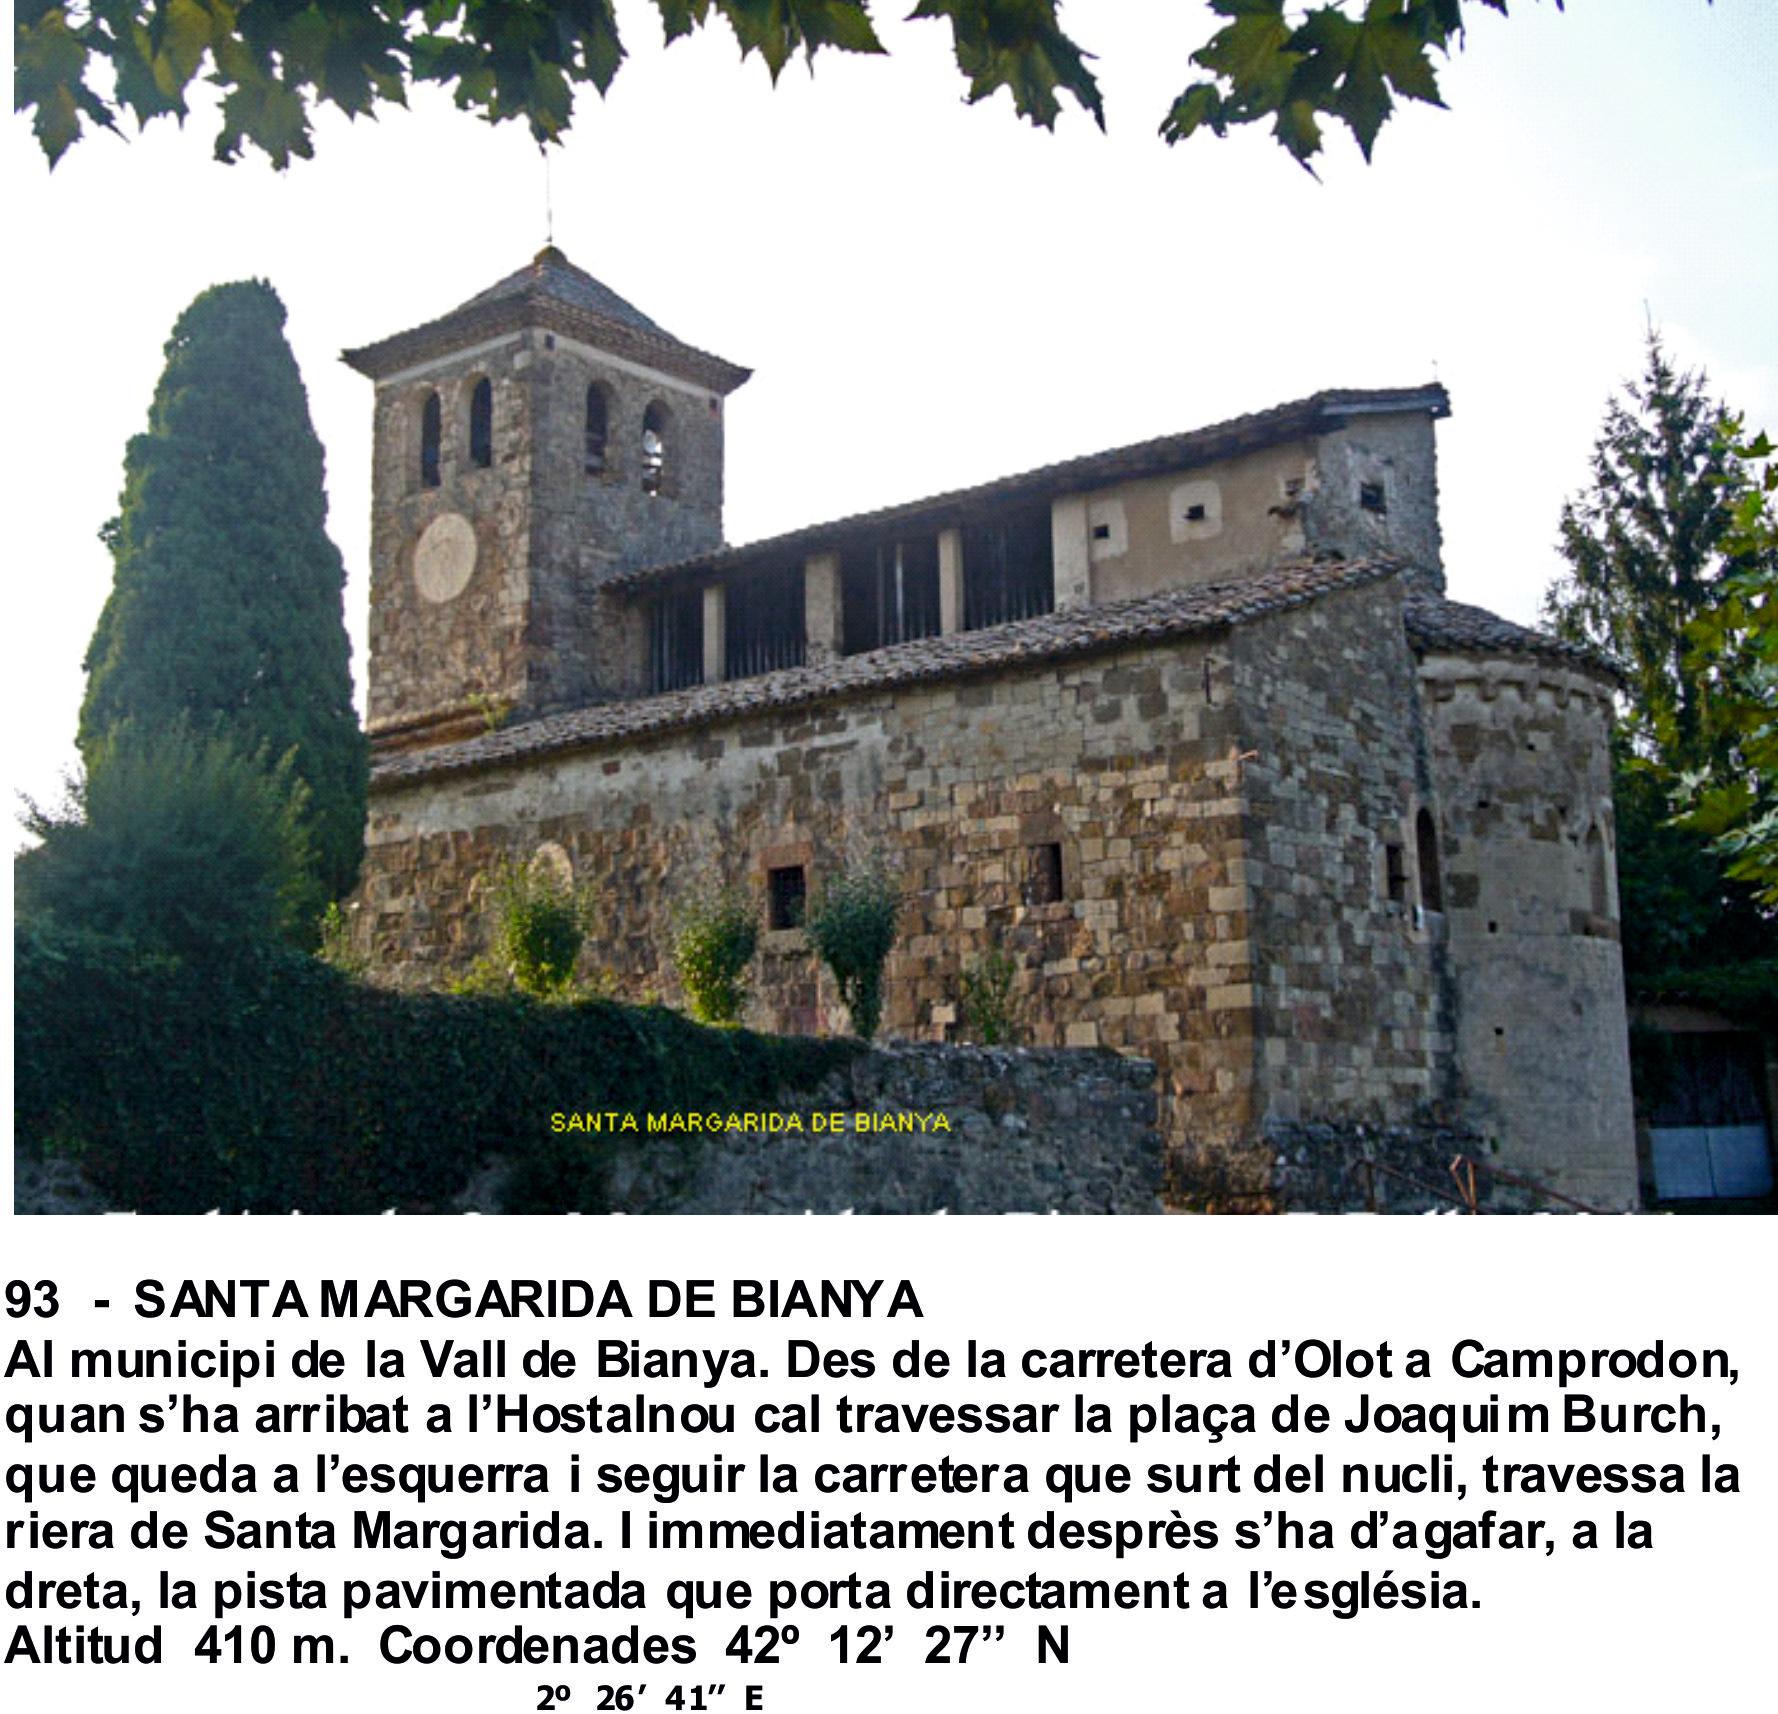 93  -  SANTA MARGARIDA DE BIANYA